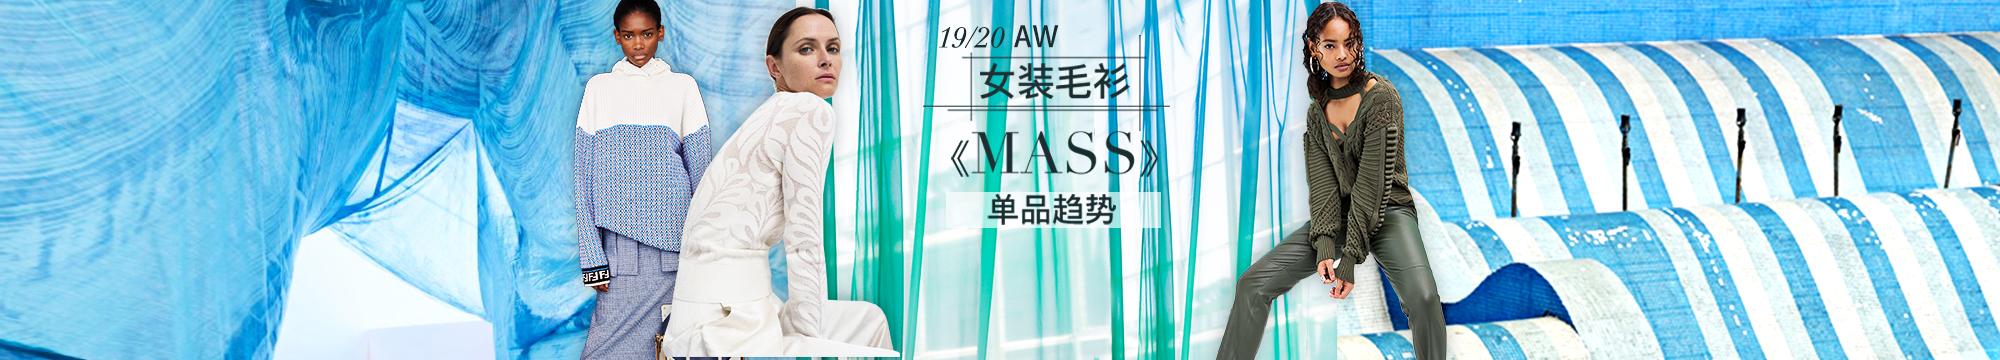 《MASS》19/20秋冬女装毛衫单品趋势